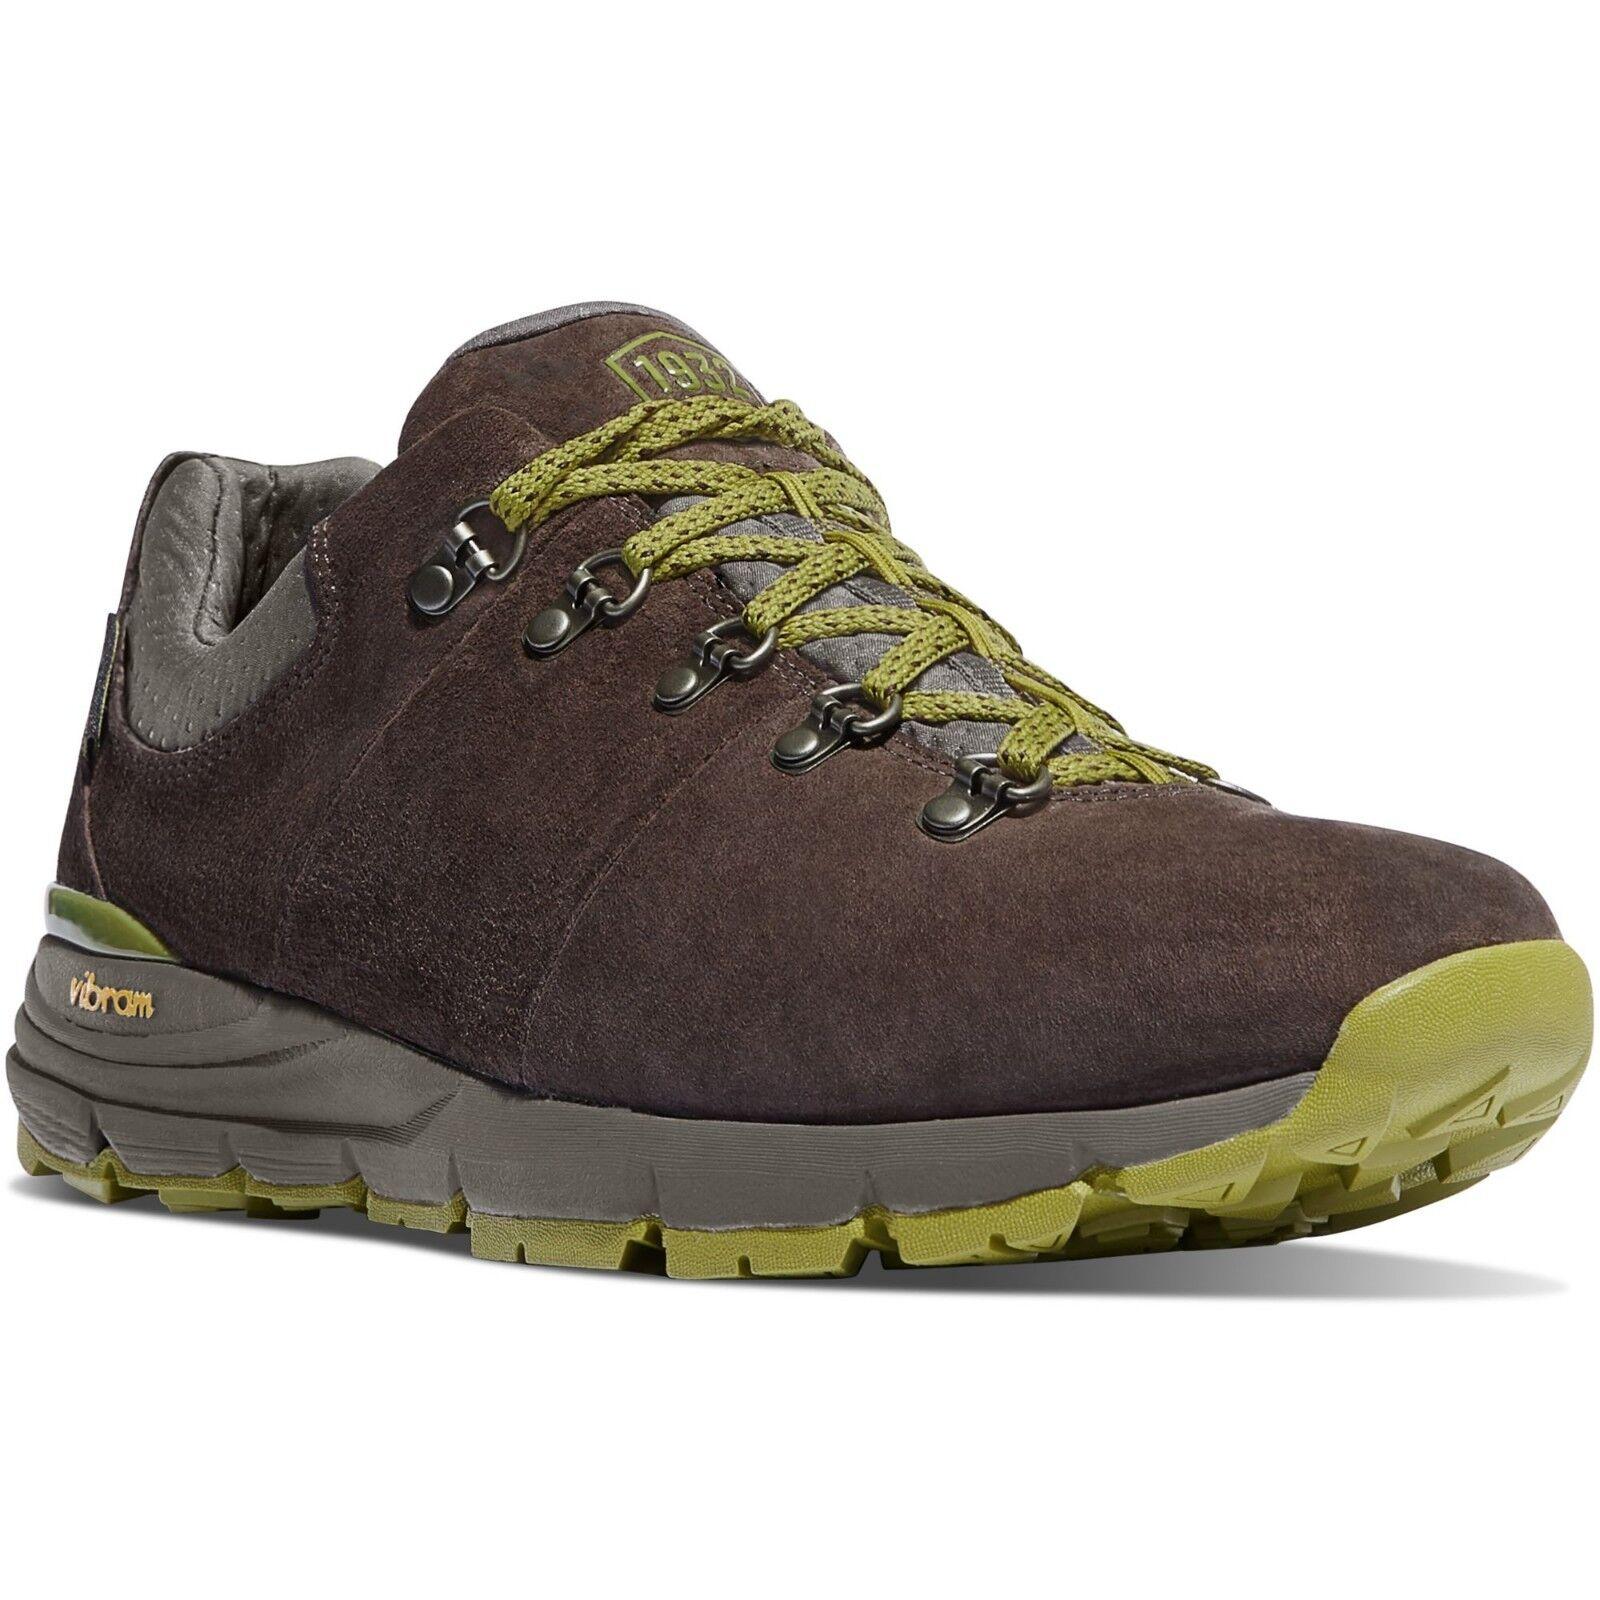 Danner Uomo 62262 Outdoor Mountain 600 Low Dark Marrone 3  Hiking Trail WP stivali